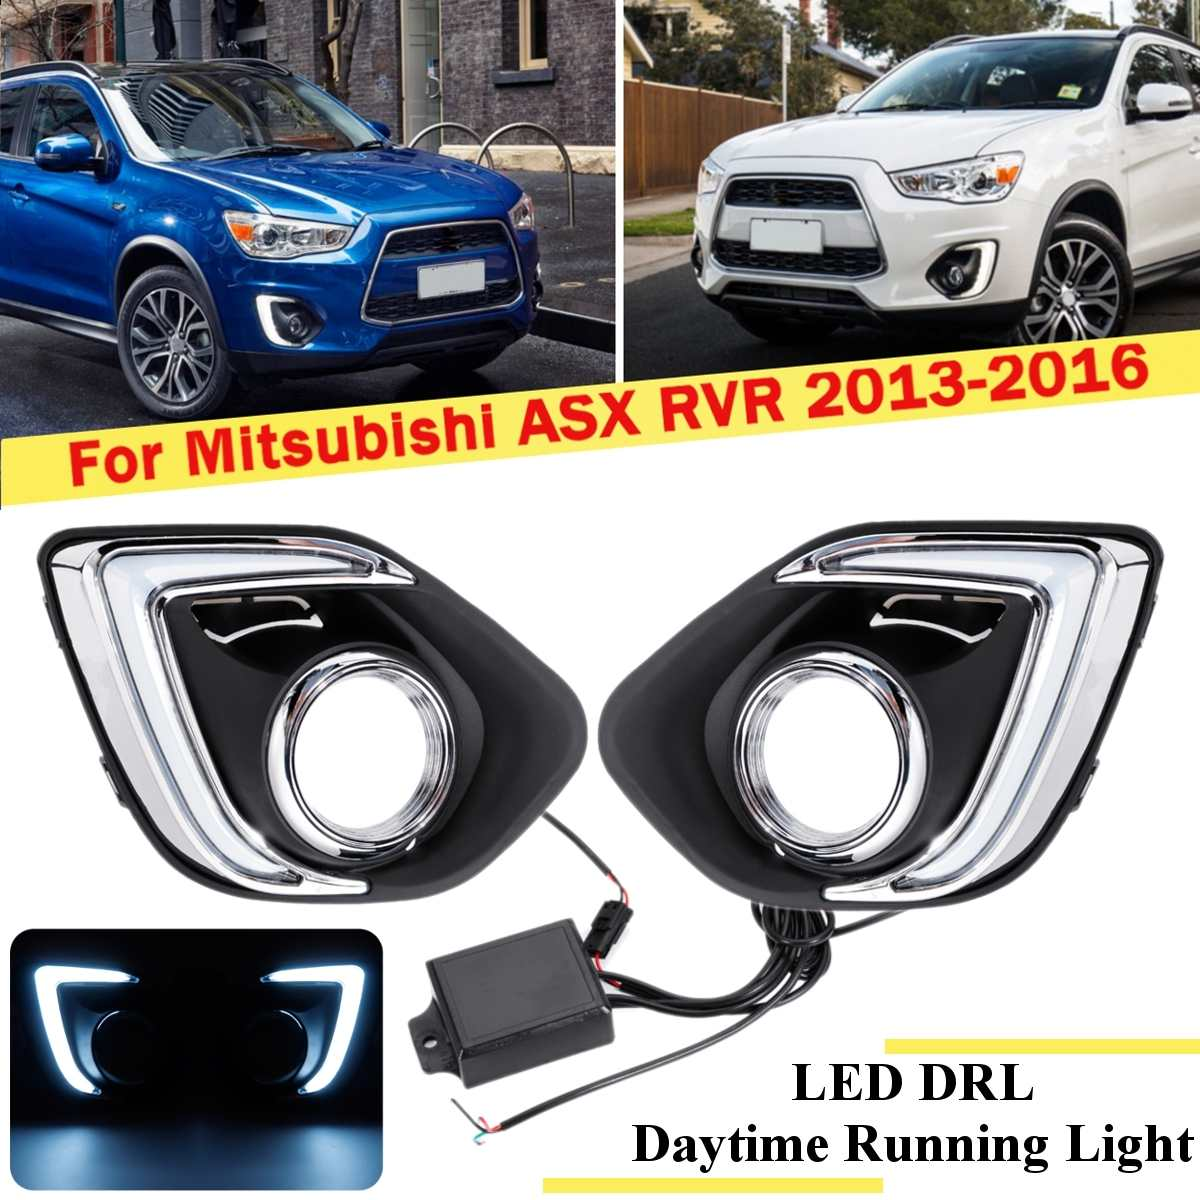 Led Drl For Mitsubishi ASX RVR 2013 2014 2015 2016 Daytime Running Light Front Bumper Driving Fog Lamp Daylight Headlight White